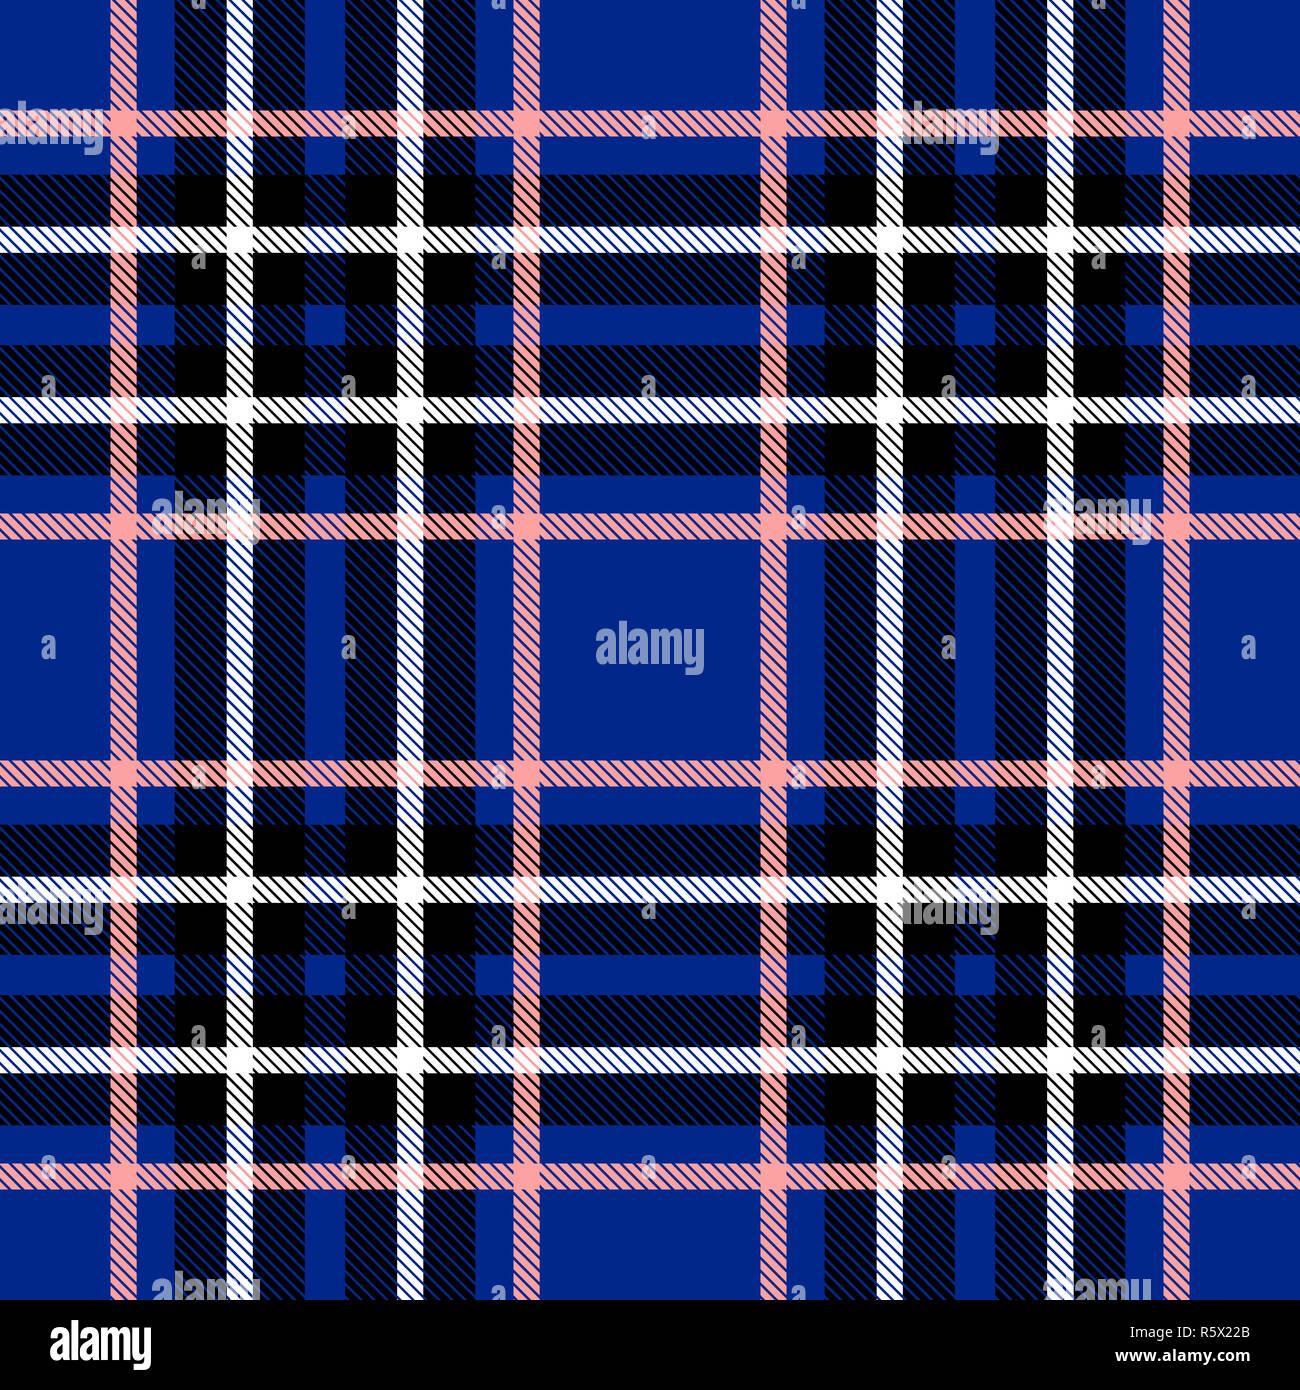 Seamless Plaid Tartan Check Pattern Blue Pink Black And White